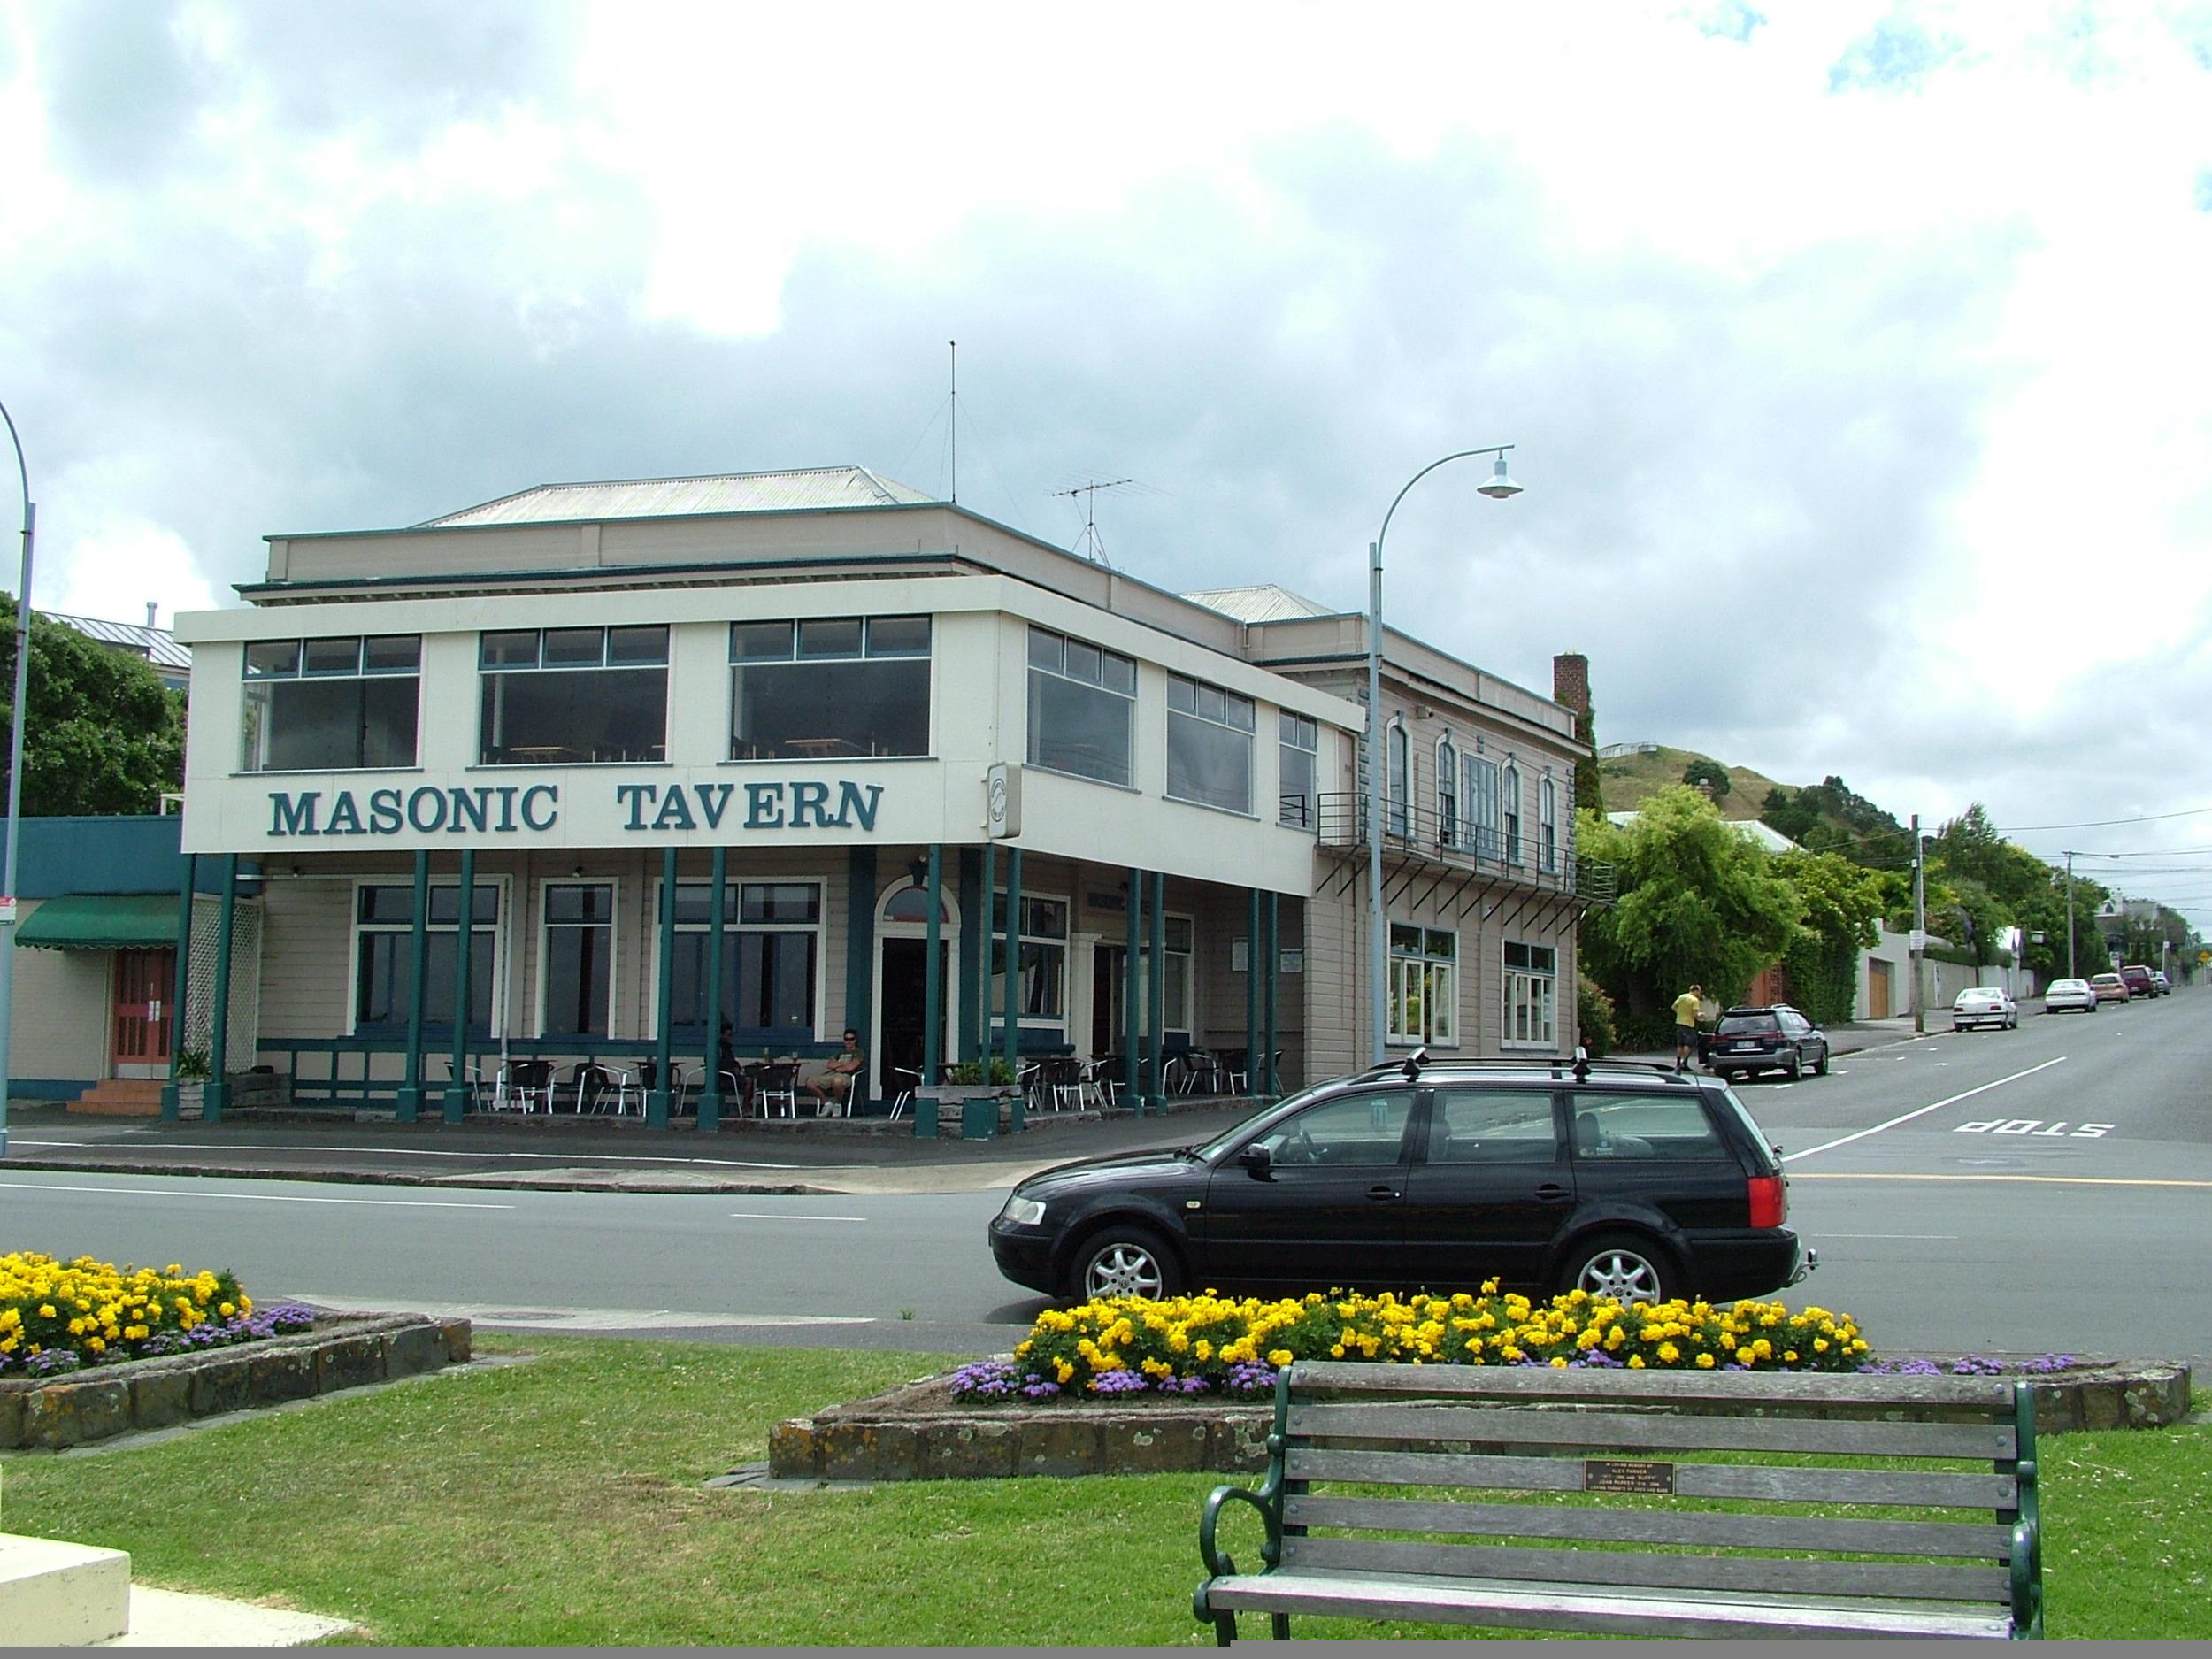 The Masonic tavern